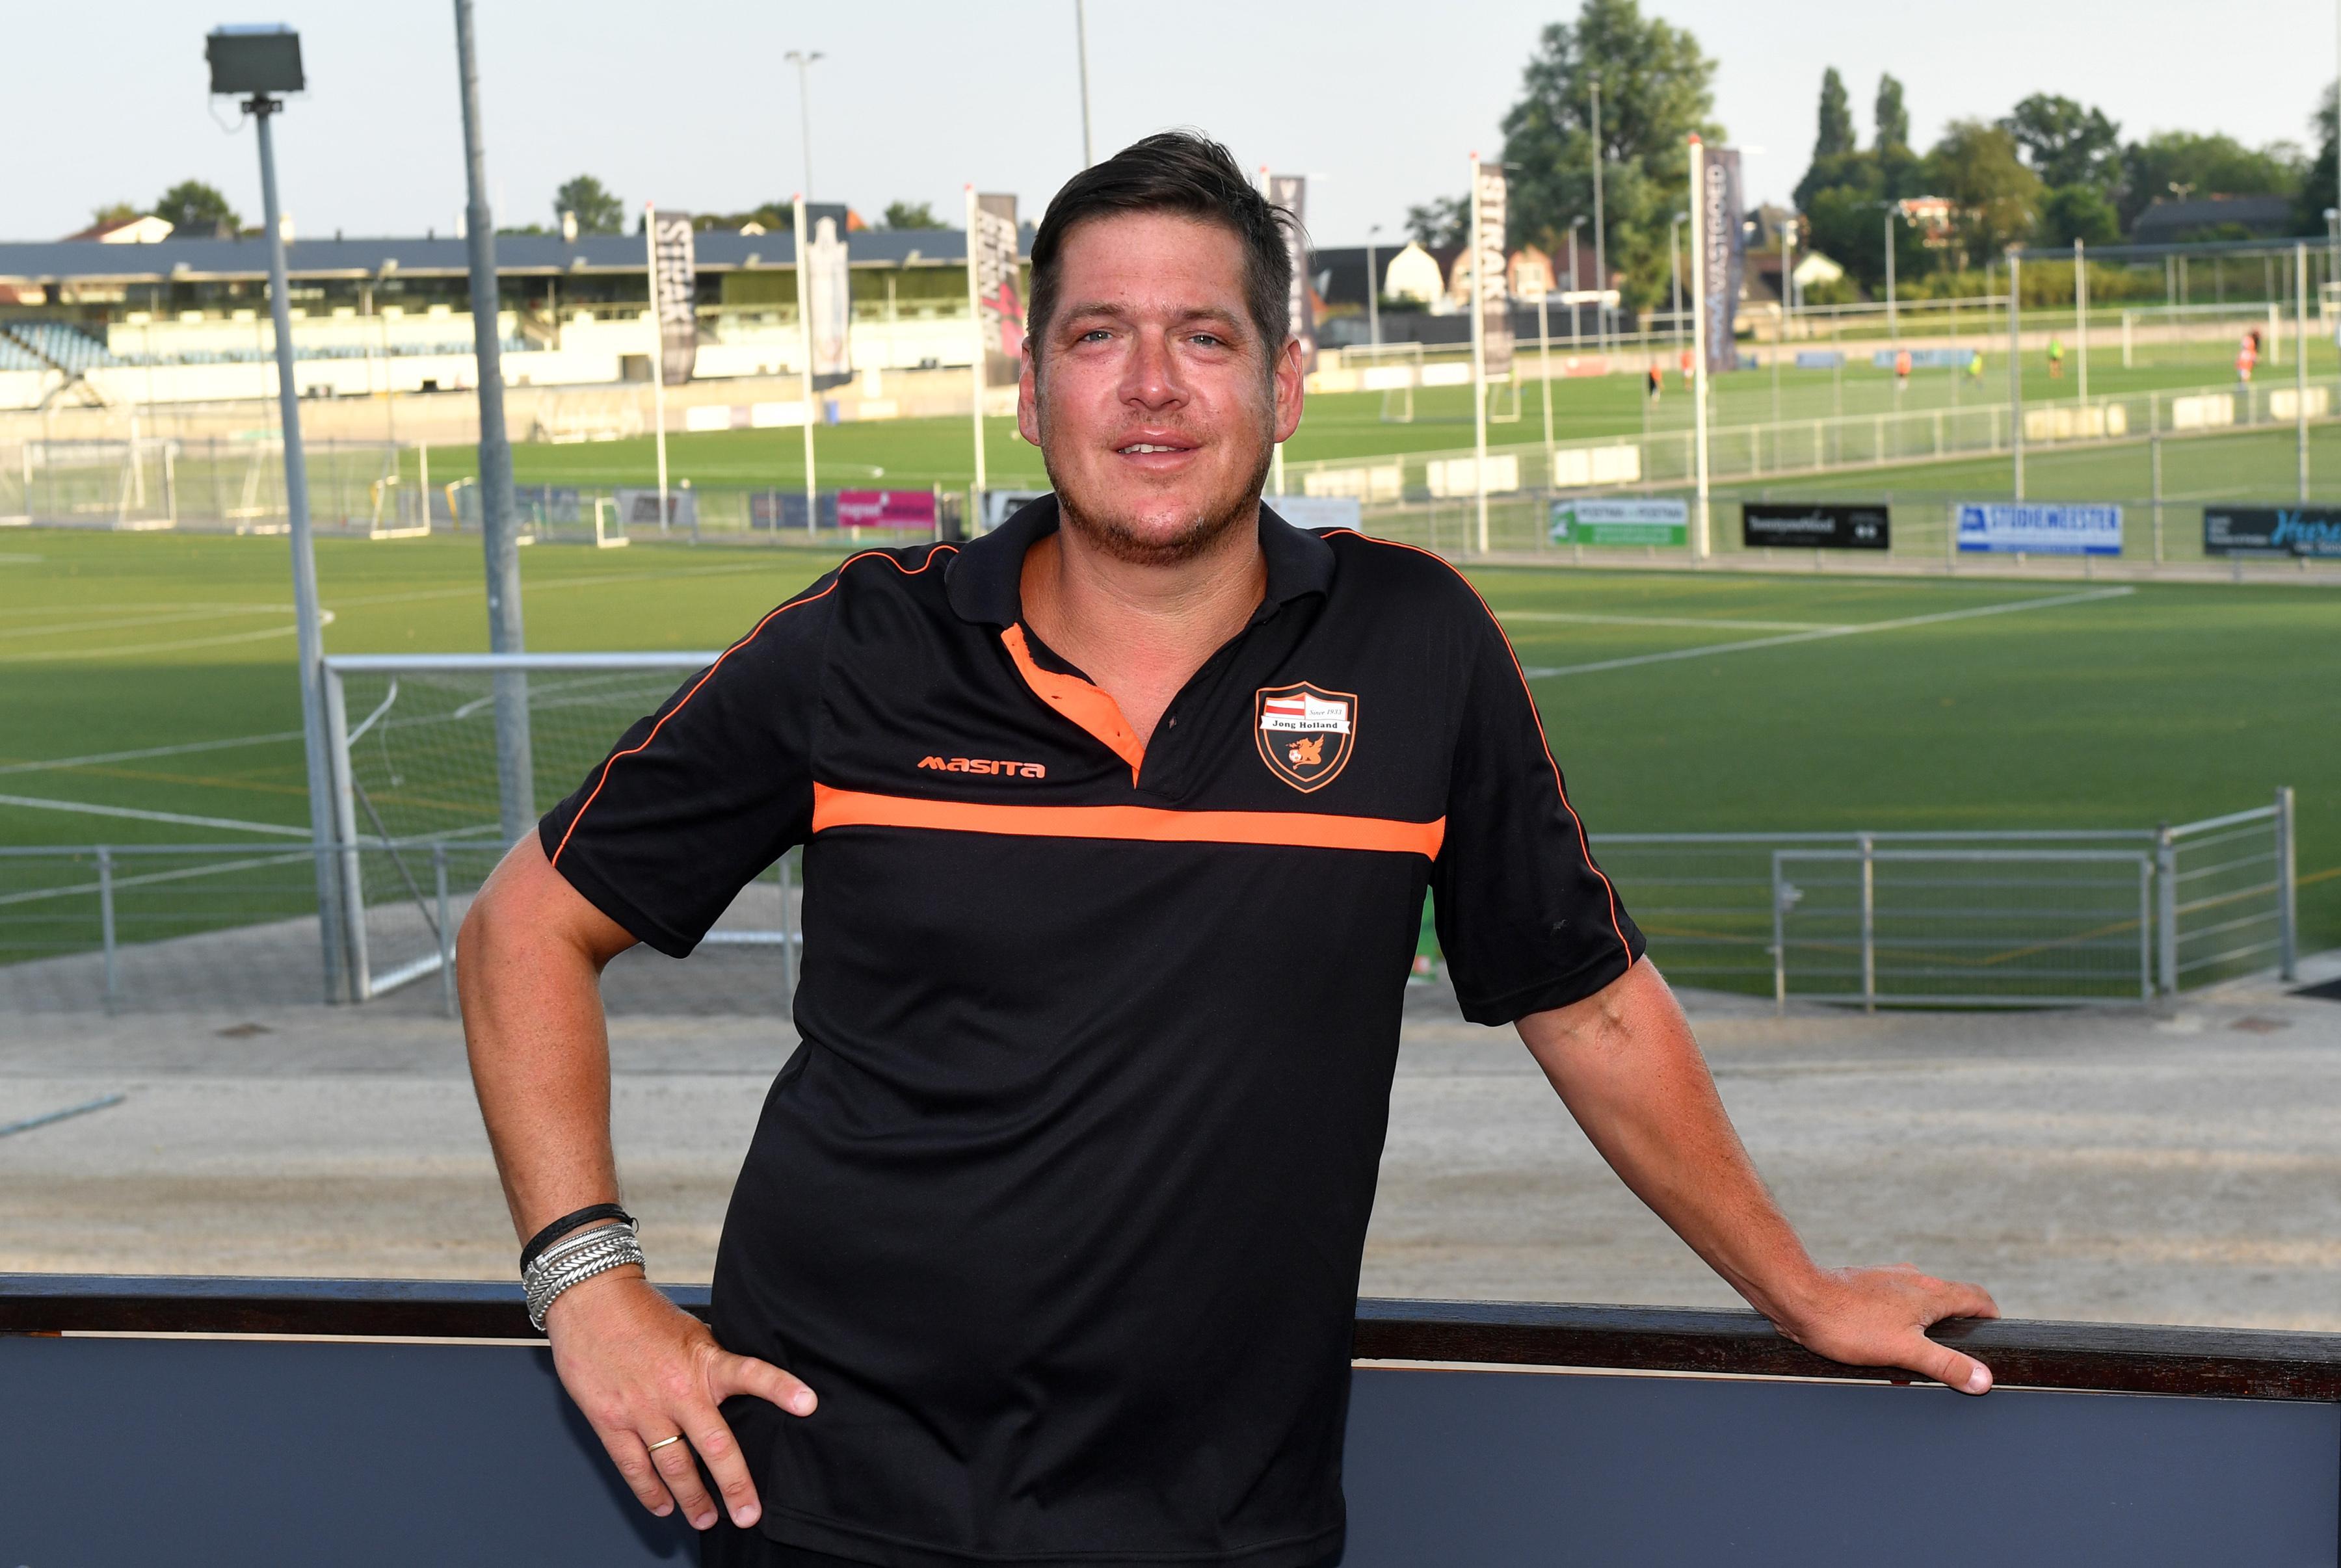 Jong Holland spreekt vertrouwen in hoofdtrainer Carl Ern uit